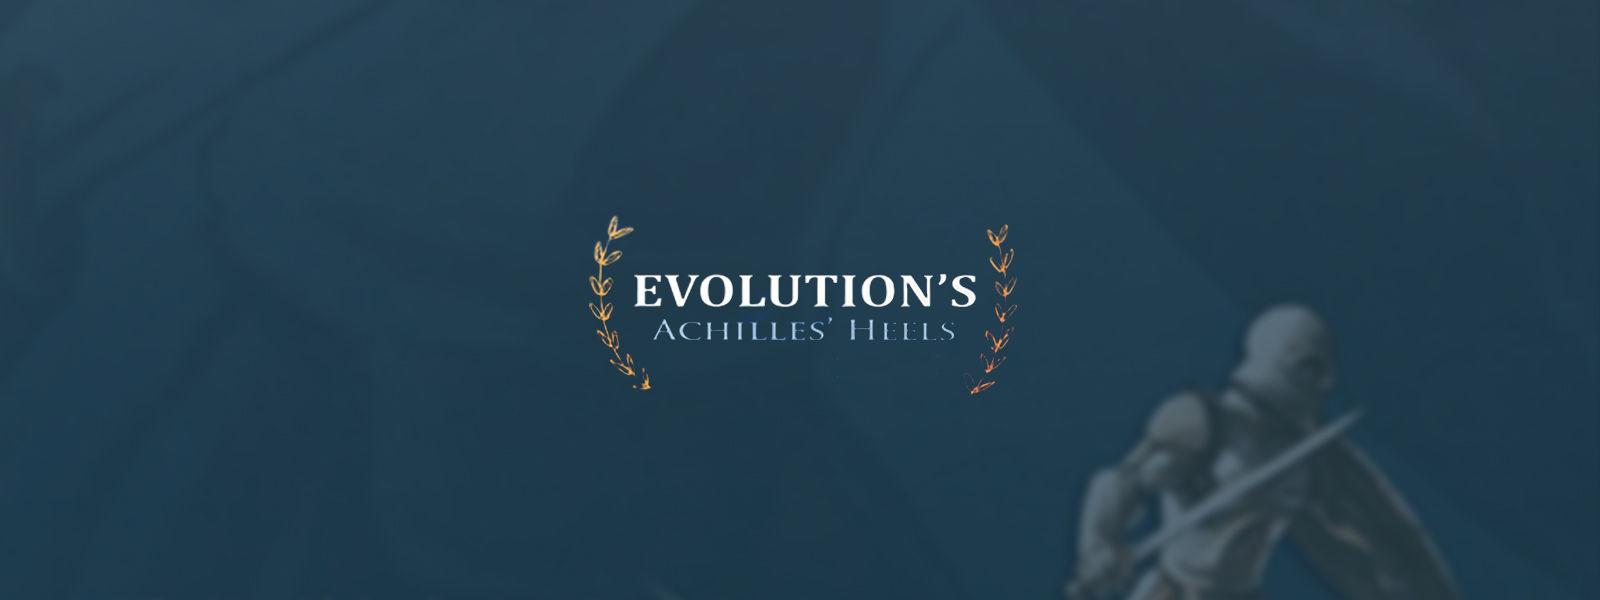 RightNow Media :: Streaming Video Bible Study : Evolution